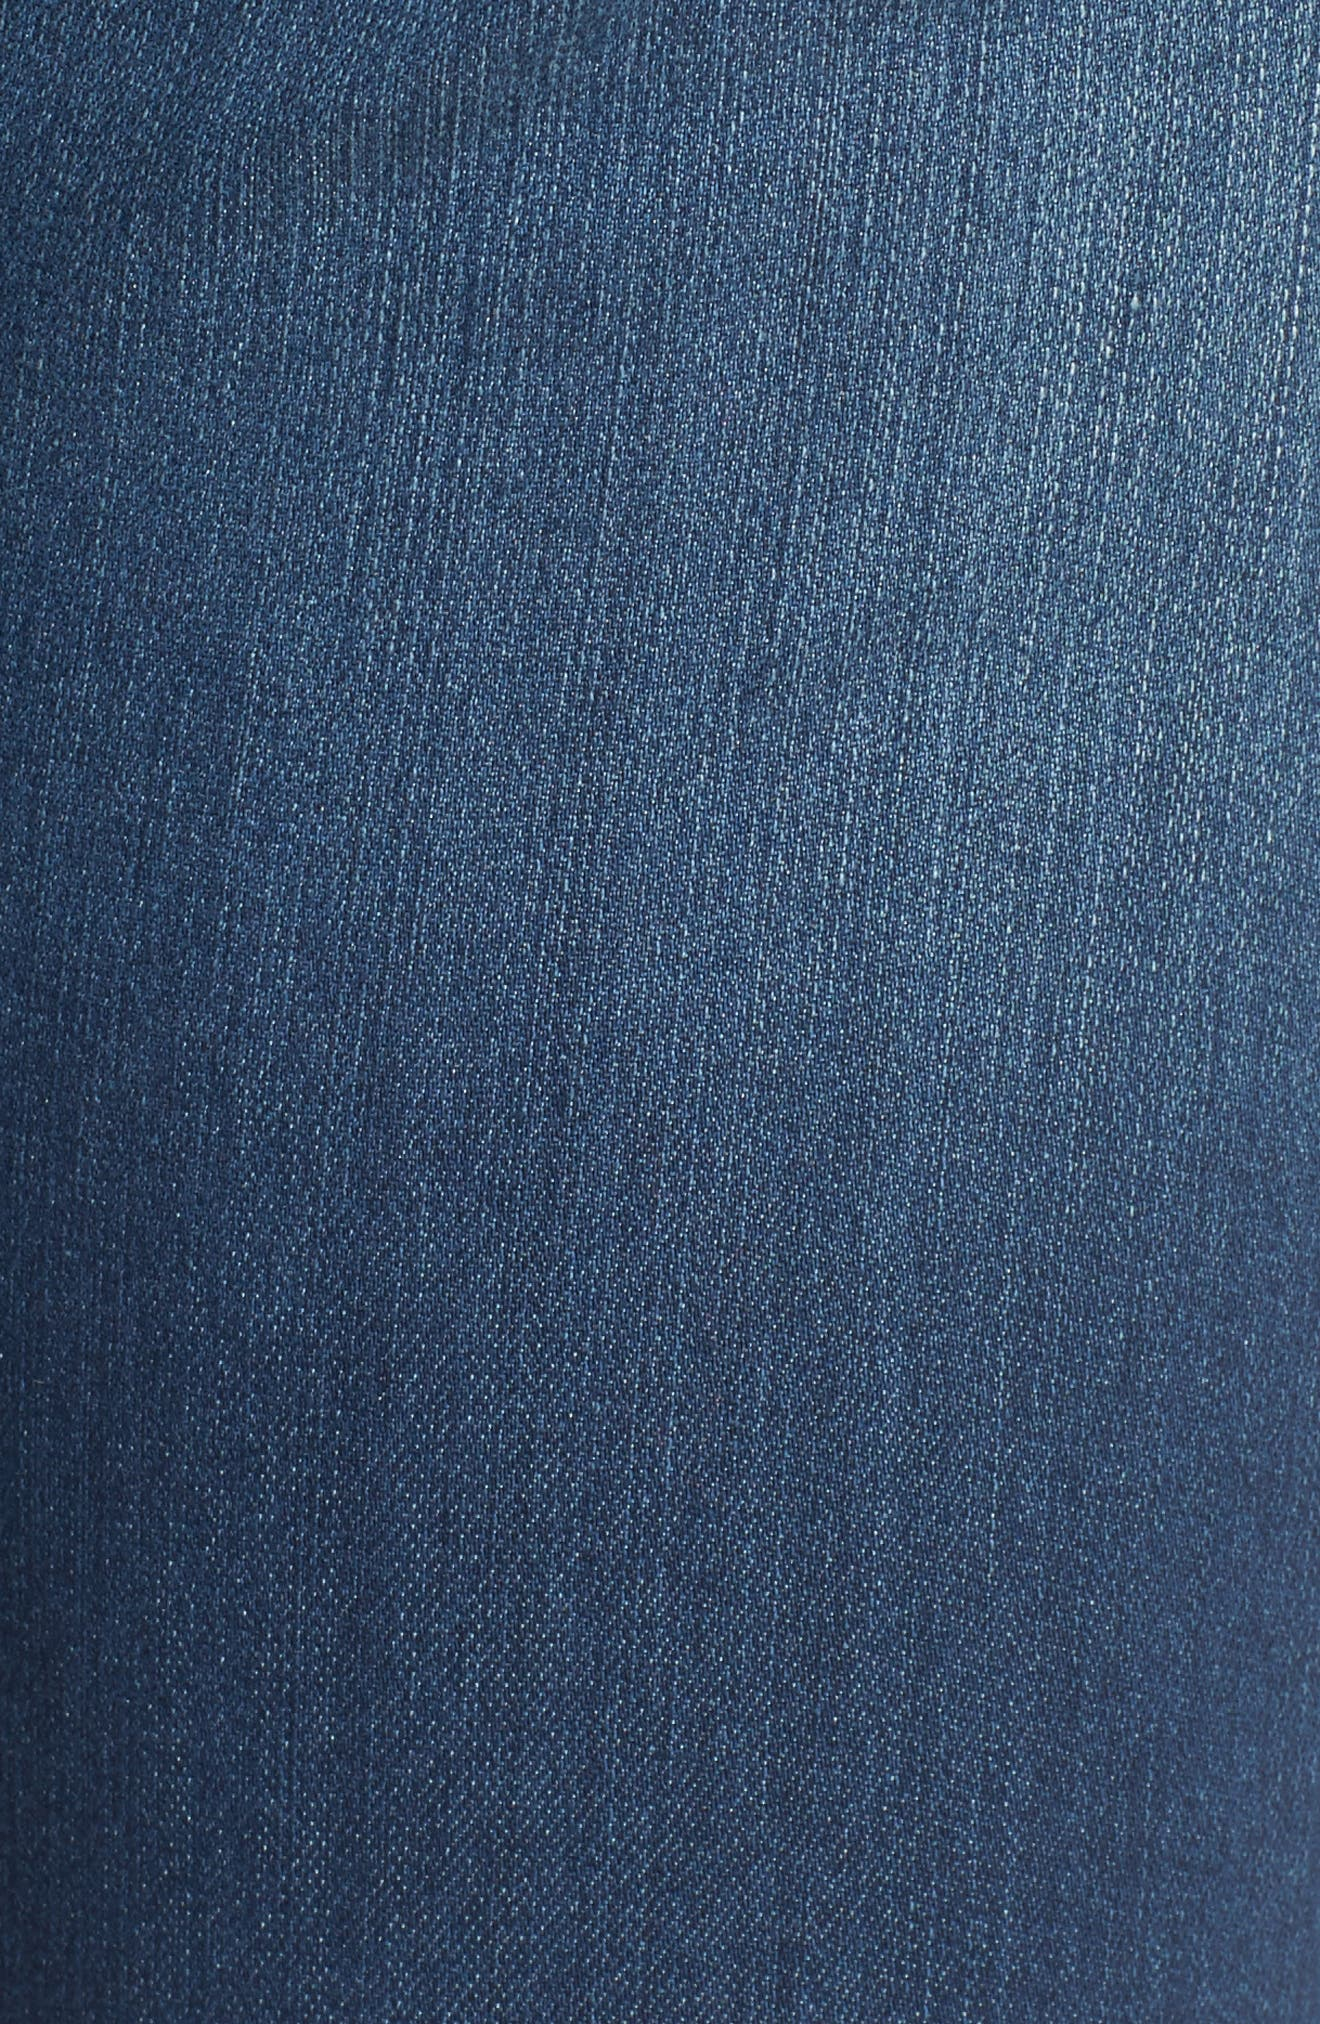 Alternate Image 5  - Wit & Wisdom Ab-solution Ankle Skimmer Jeans (Nordstrom Exclusive)